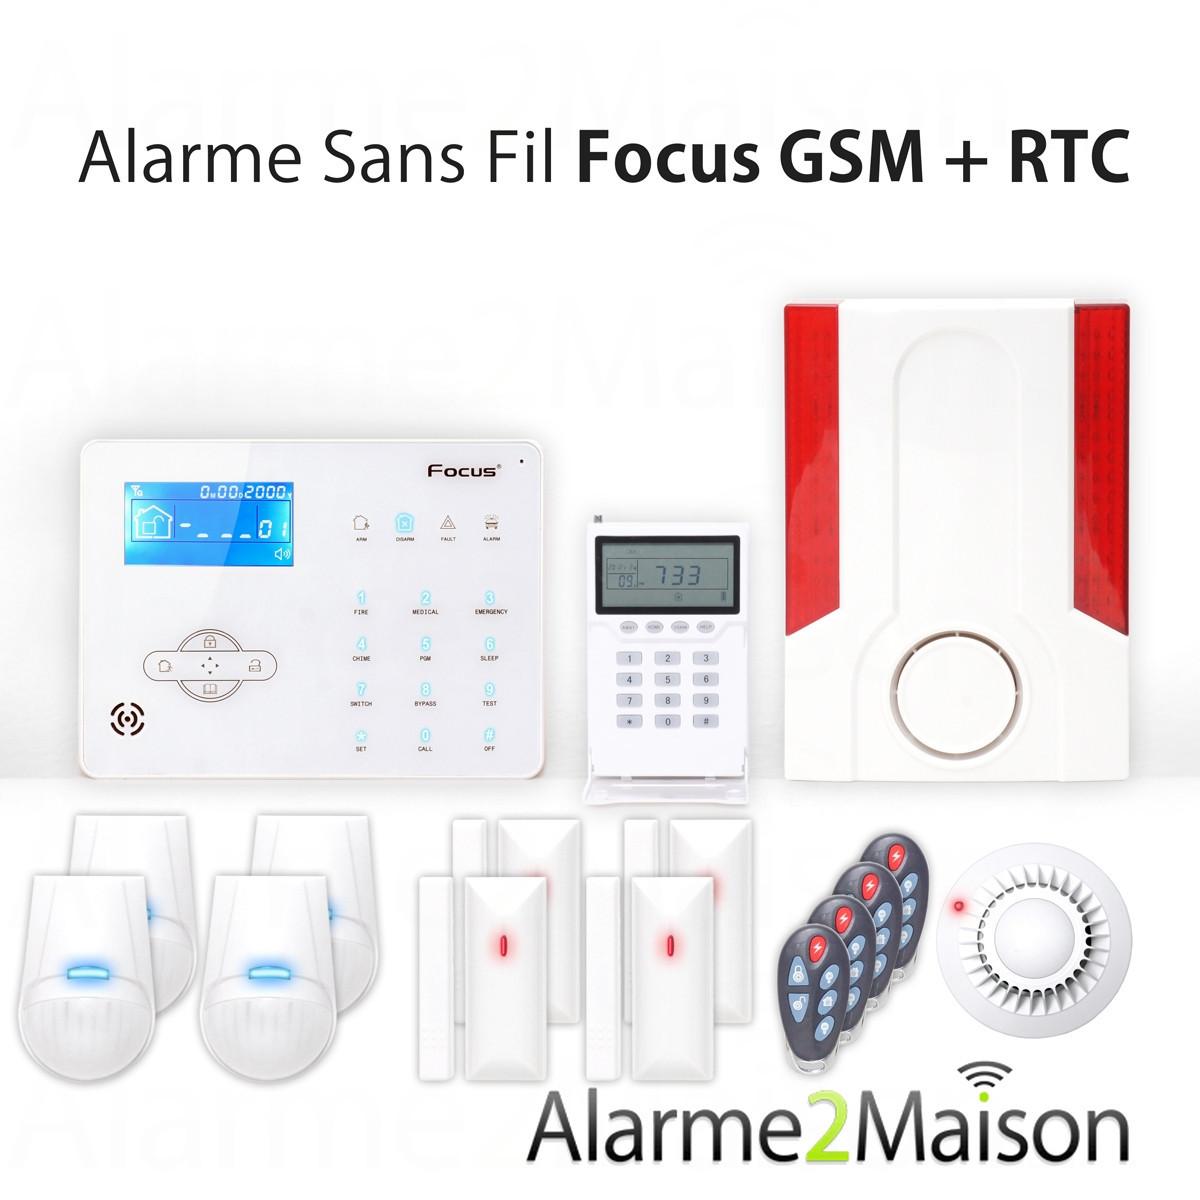 alarme anti intrusion focus achat vente de alarme anti intrusion focus comparez les prix. Black Bedroom Furniture Sets. Home Design Ideas